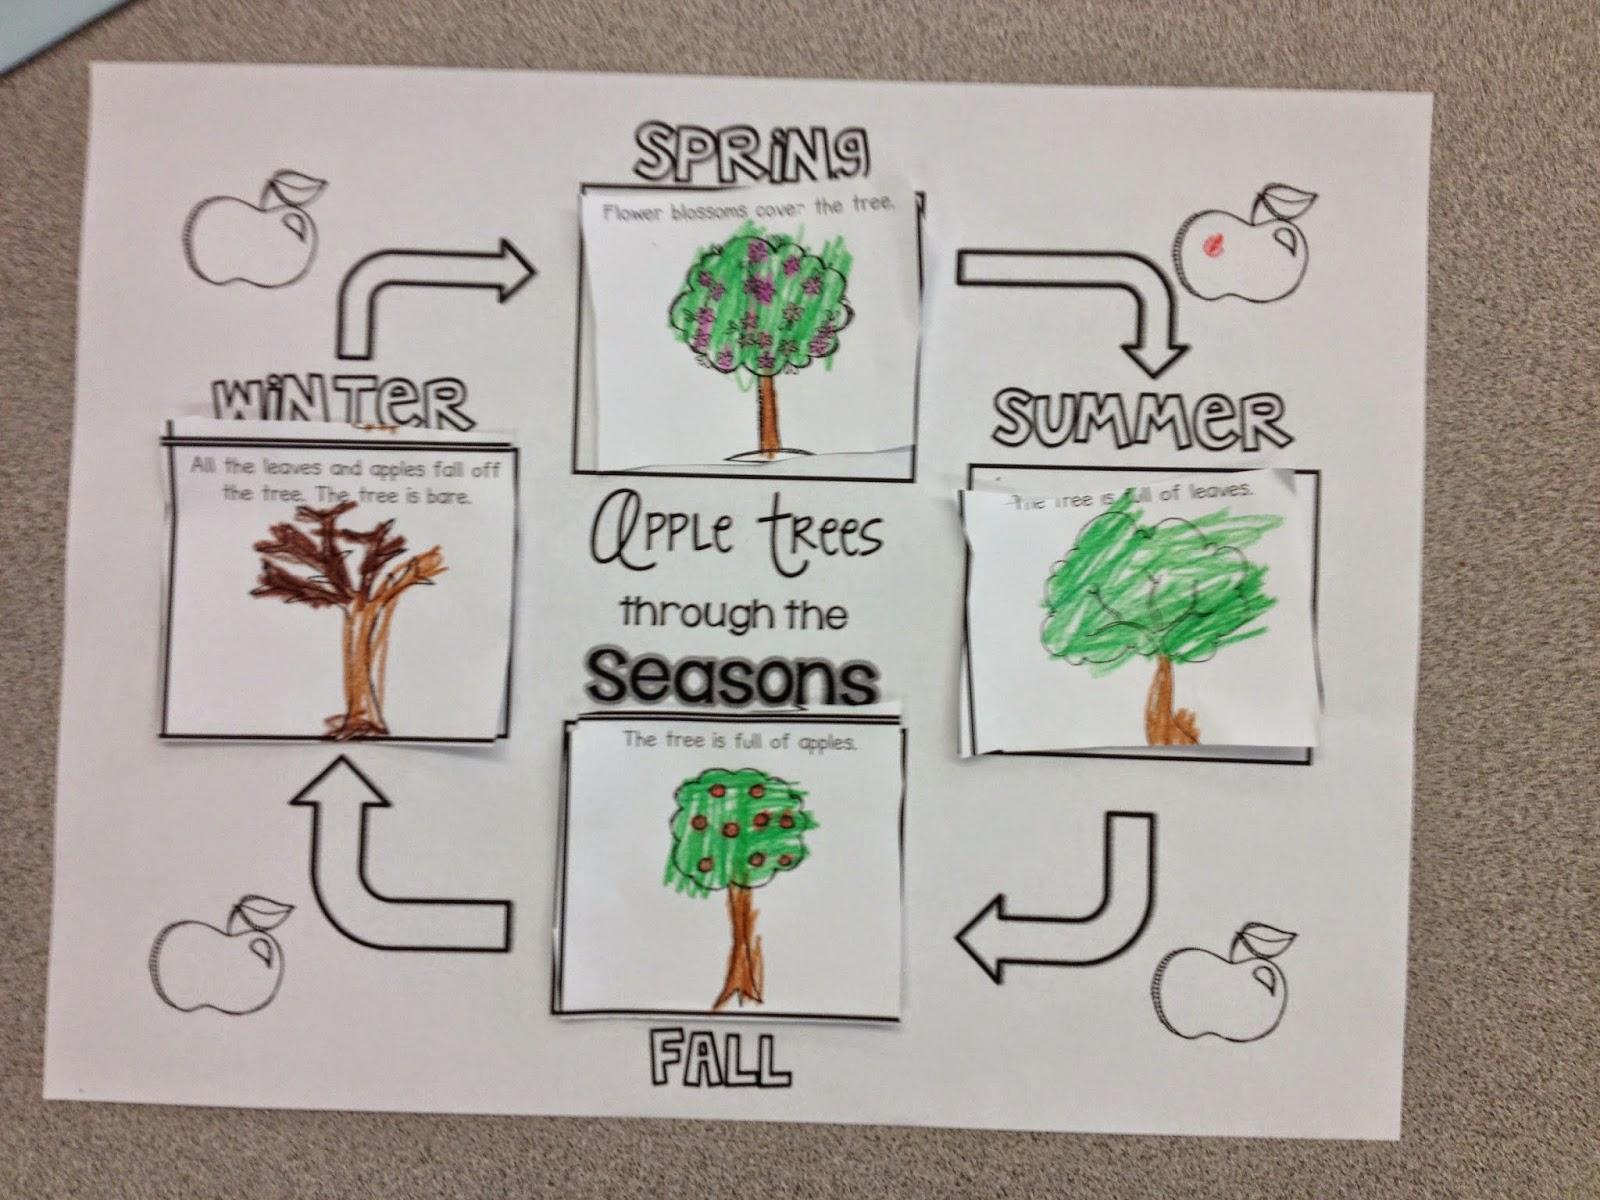 Kinder Kicks In Room 6 The Seasons Of An Apple Tree